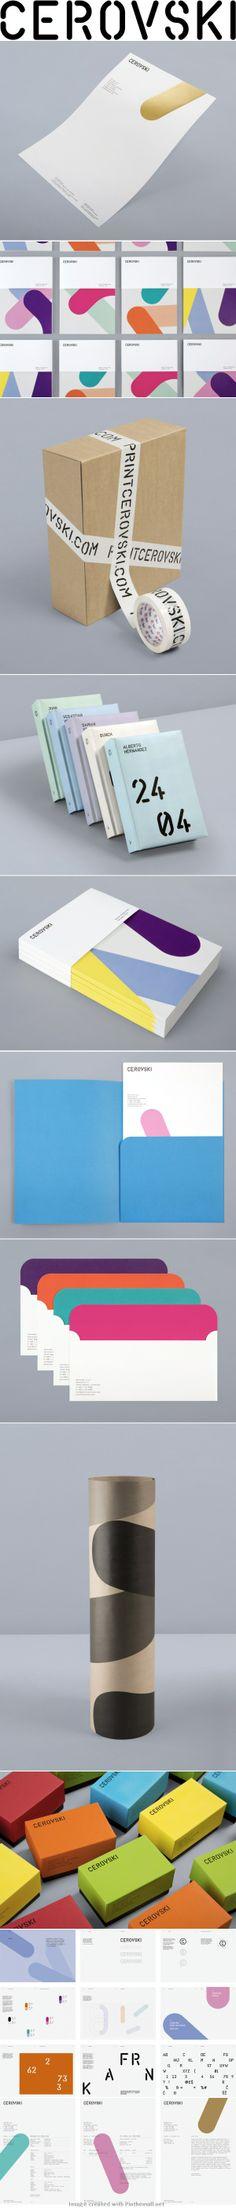 Cerovski (Croatia Printing Co)   by Bunch